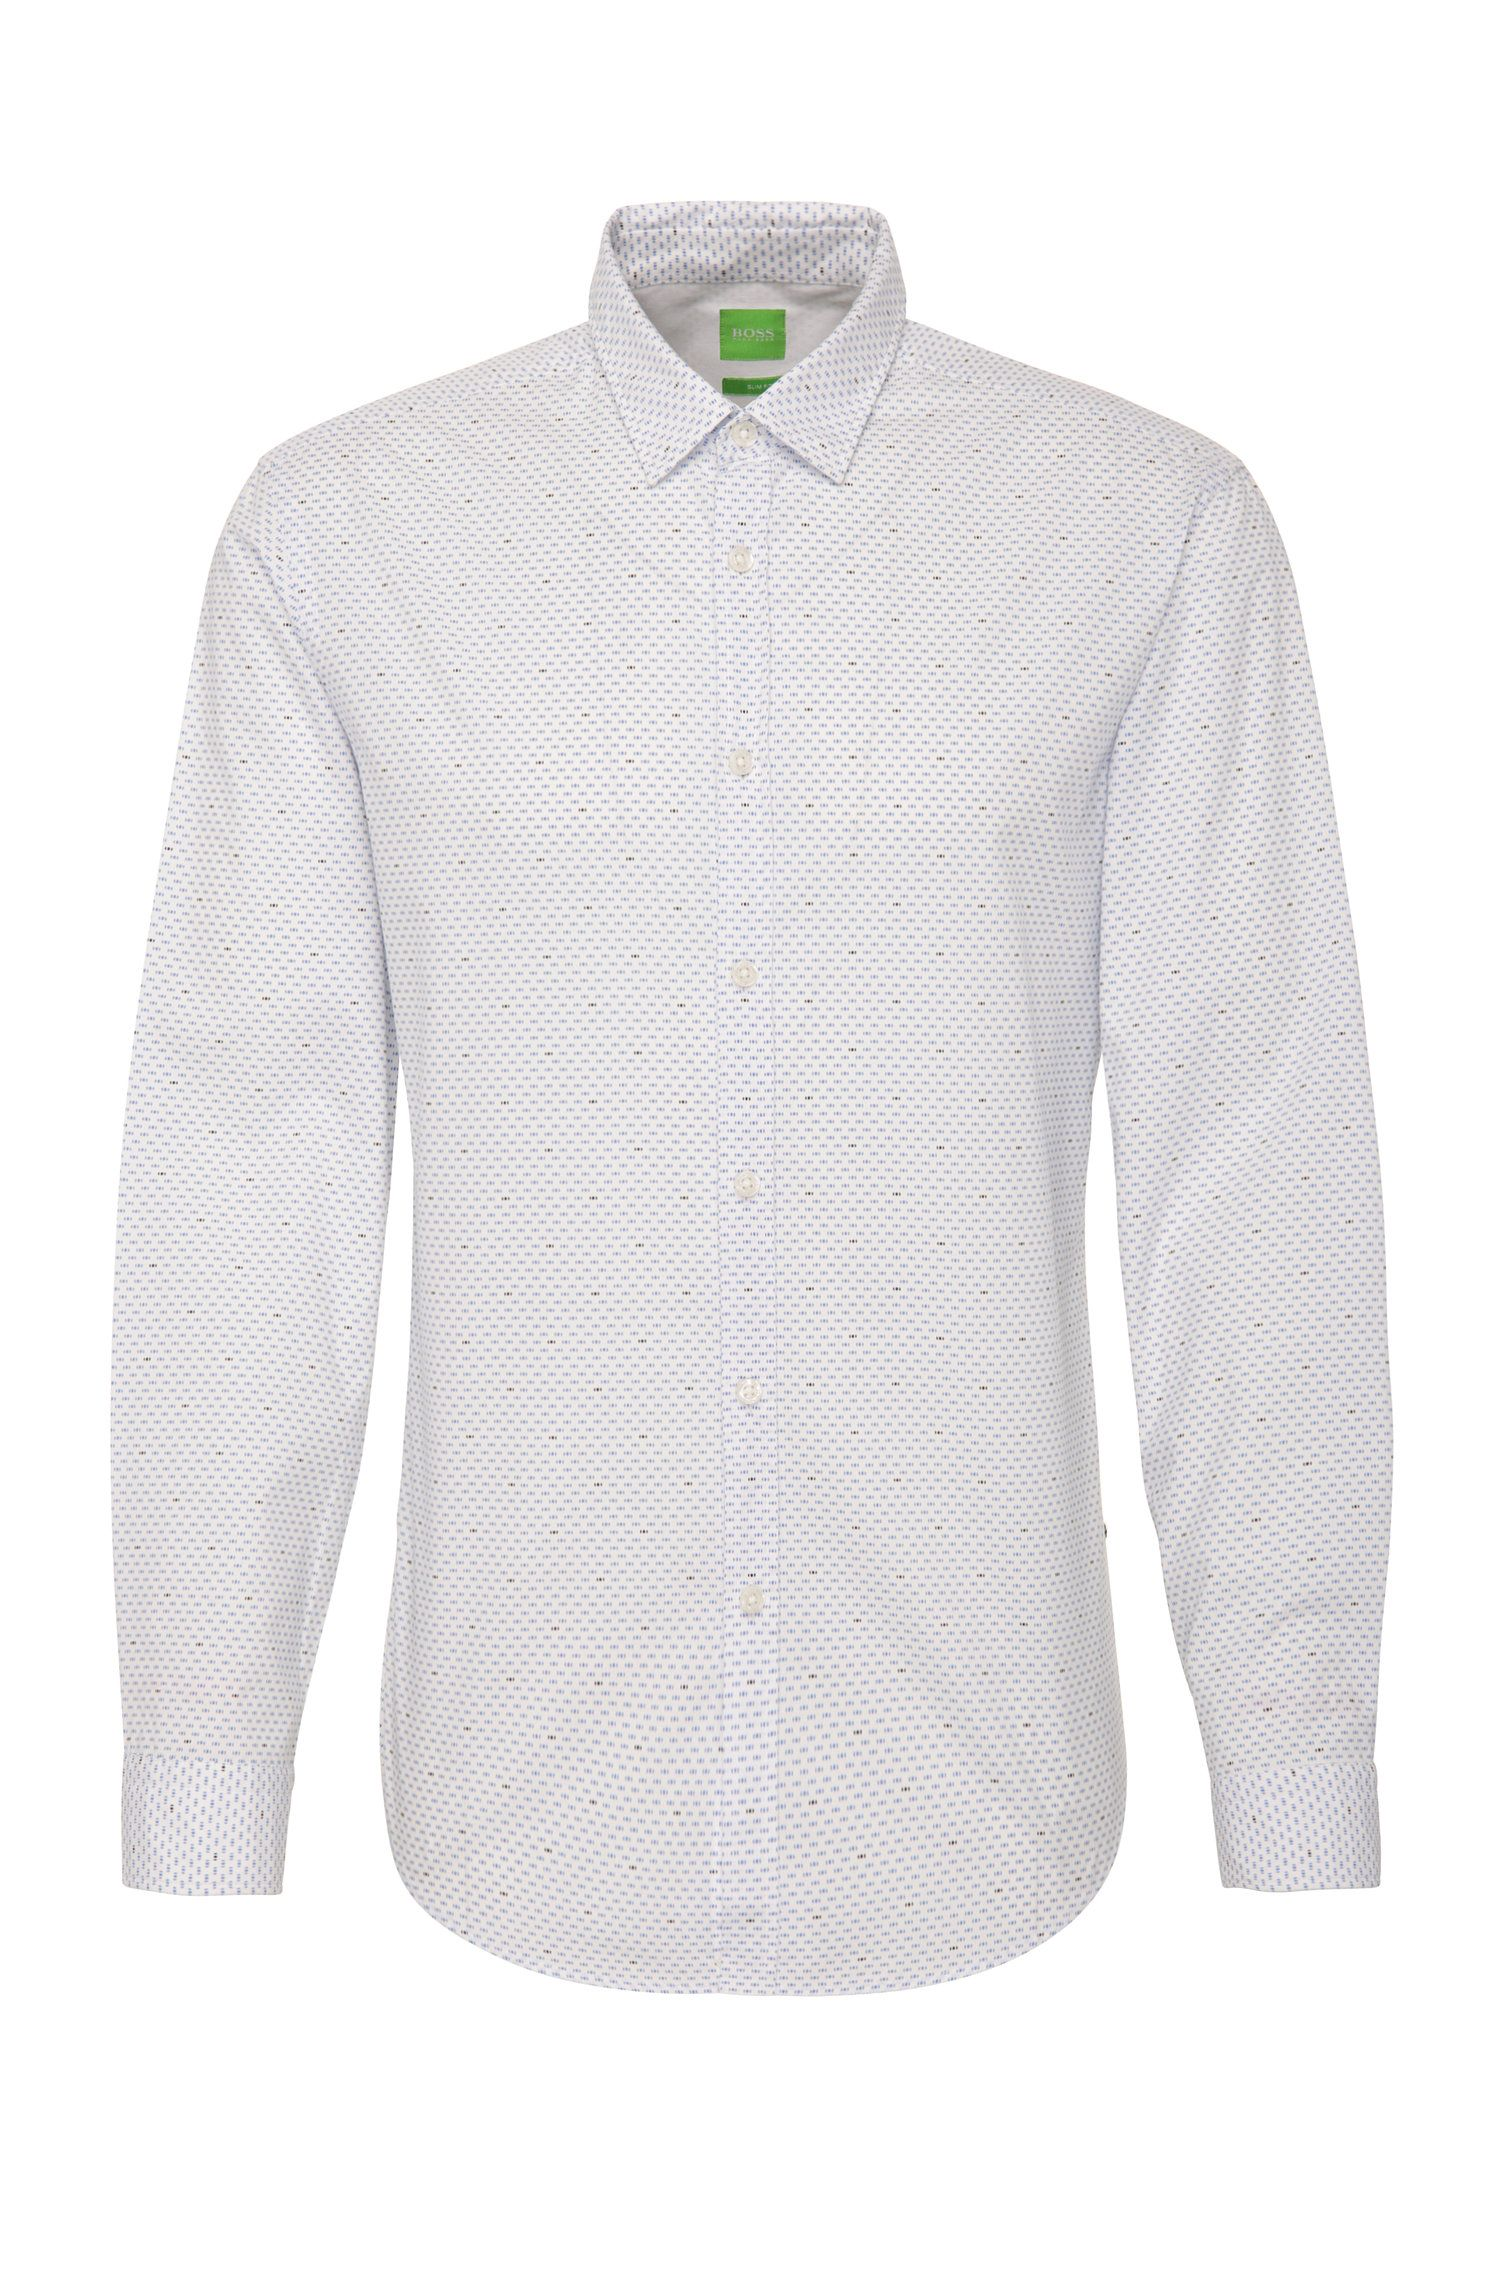 Slim-fit cotton shirt with polka-dot pattern: 'C-Bocci'